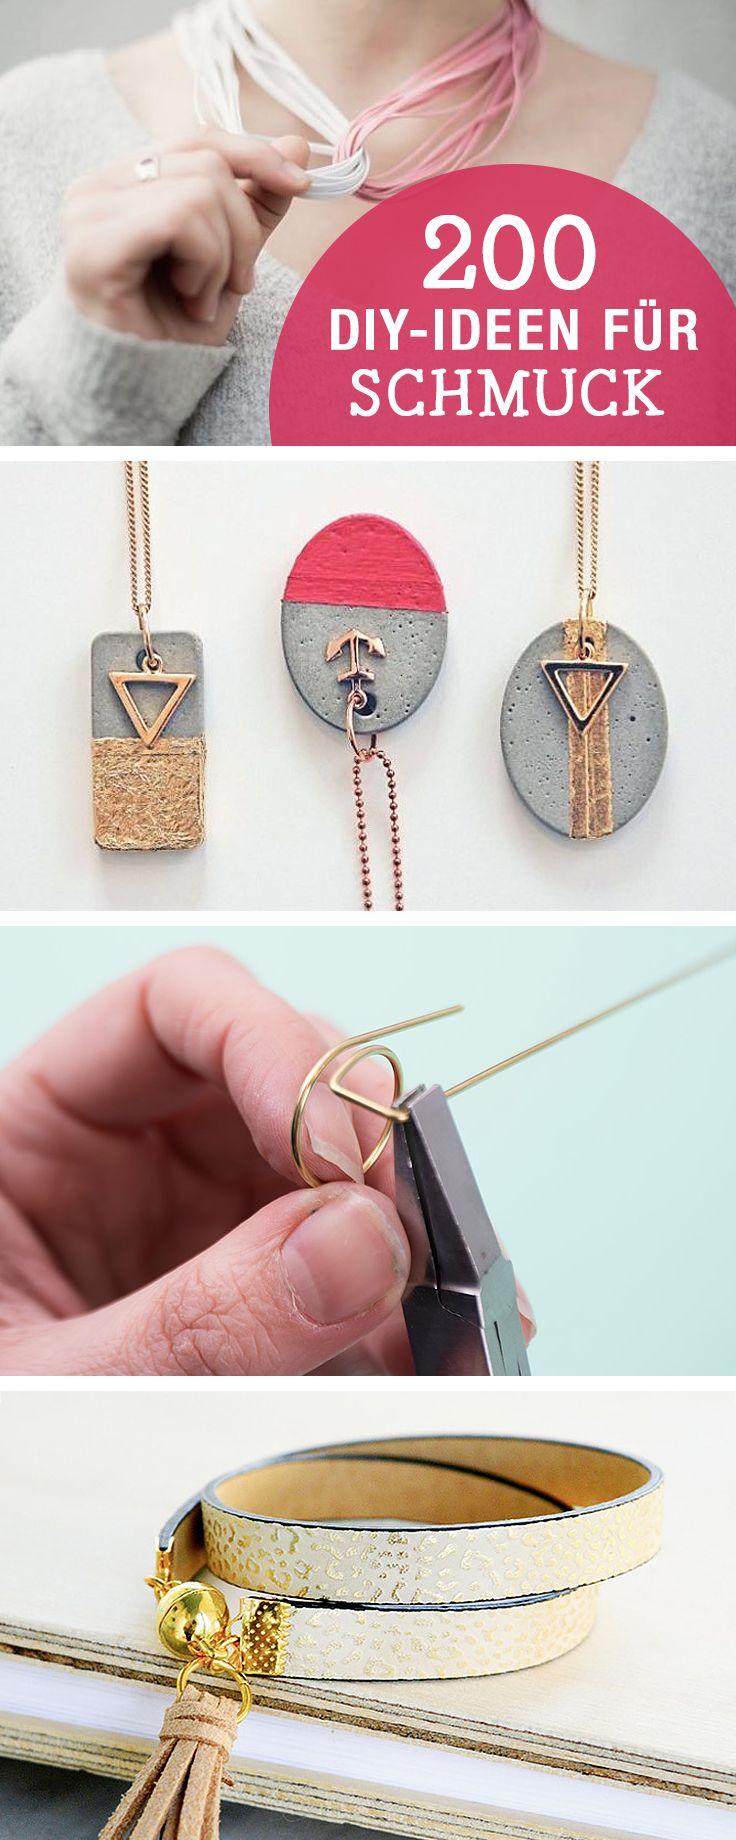 DIY-Anleitungen für Schmuck, kreative Ideen zum Schmuck selbermachen / diy tutorials for jewelry, crafting jewelry via DaWanda.com